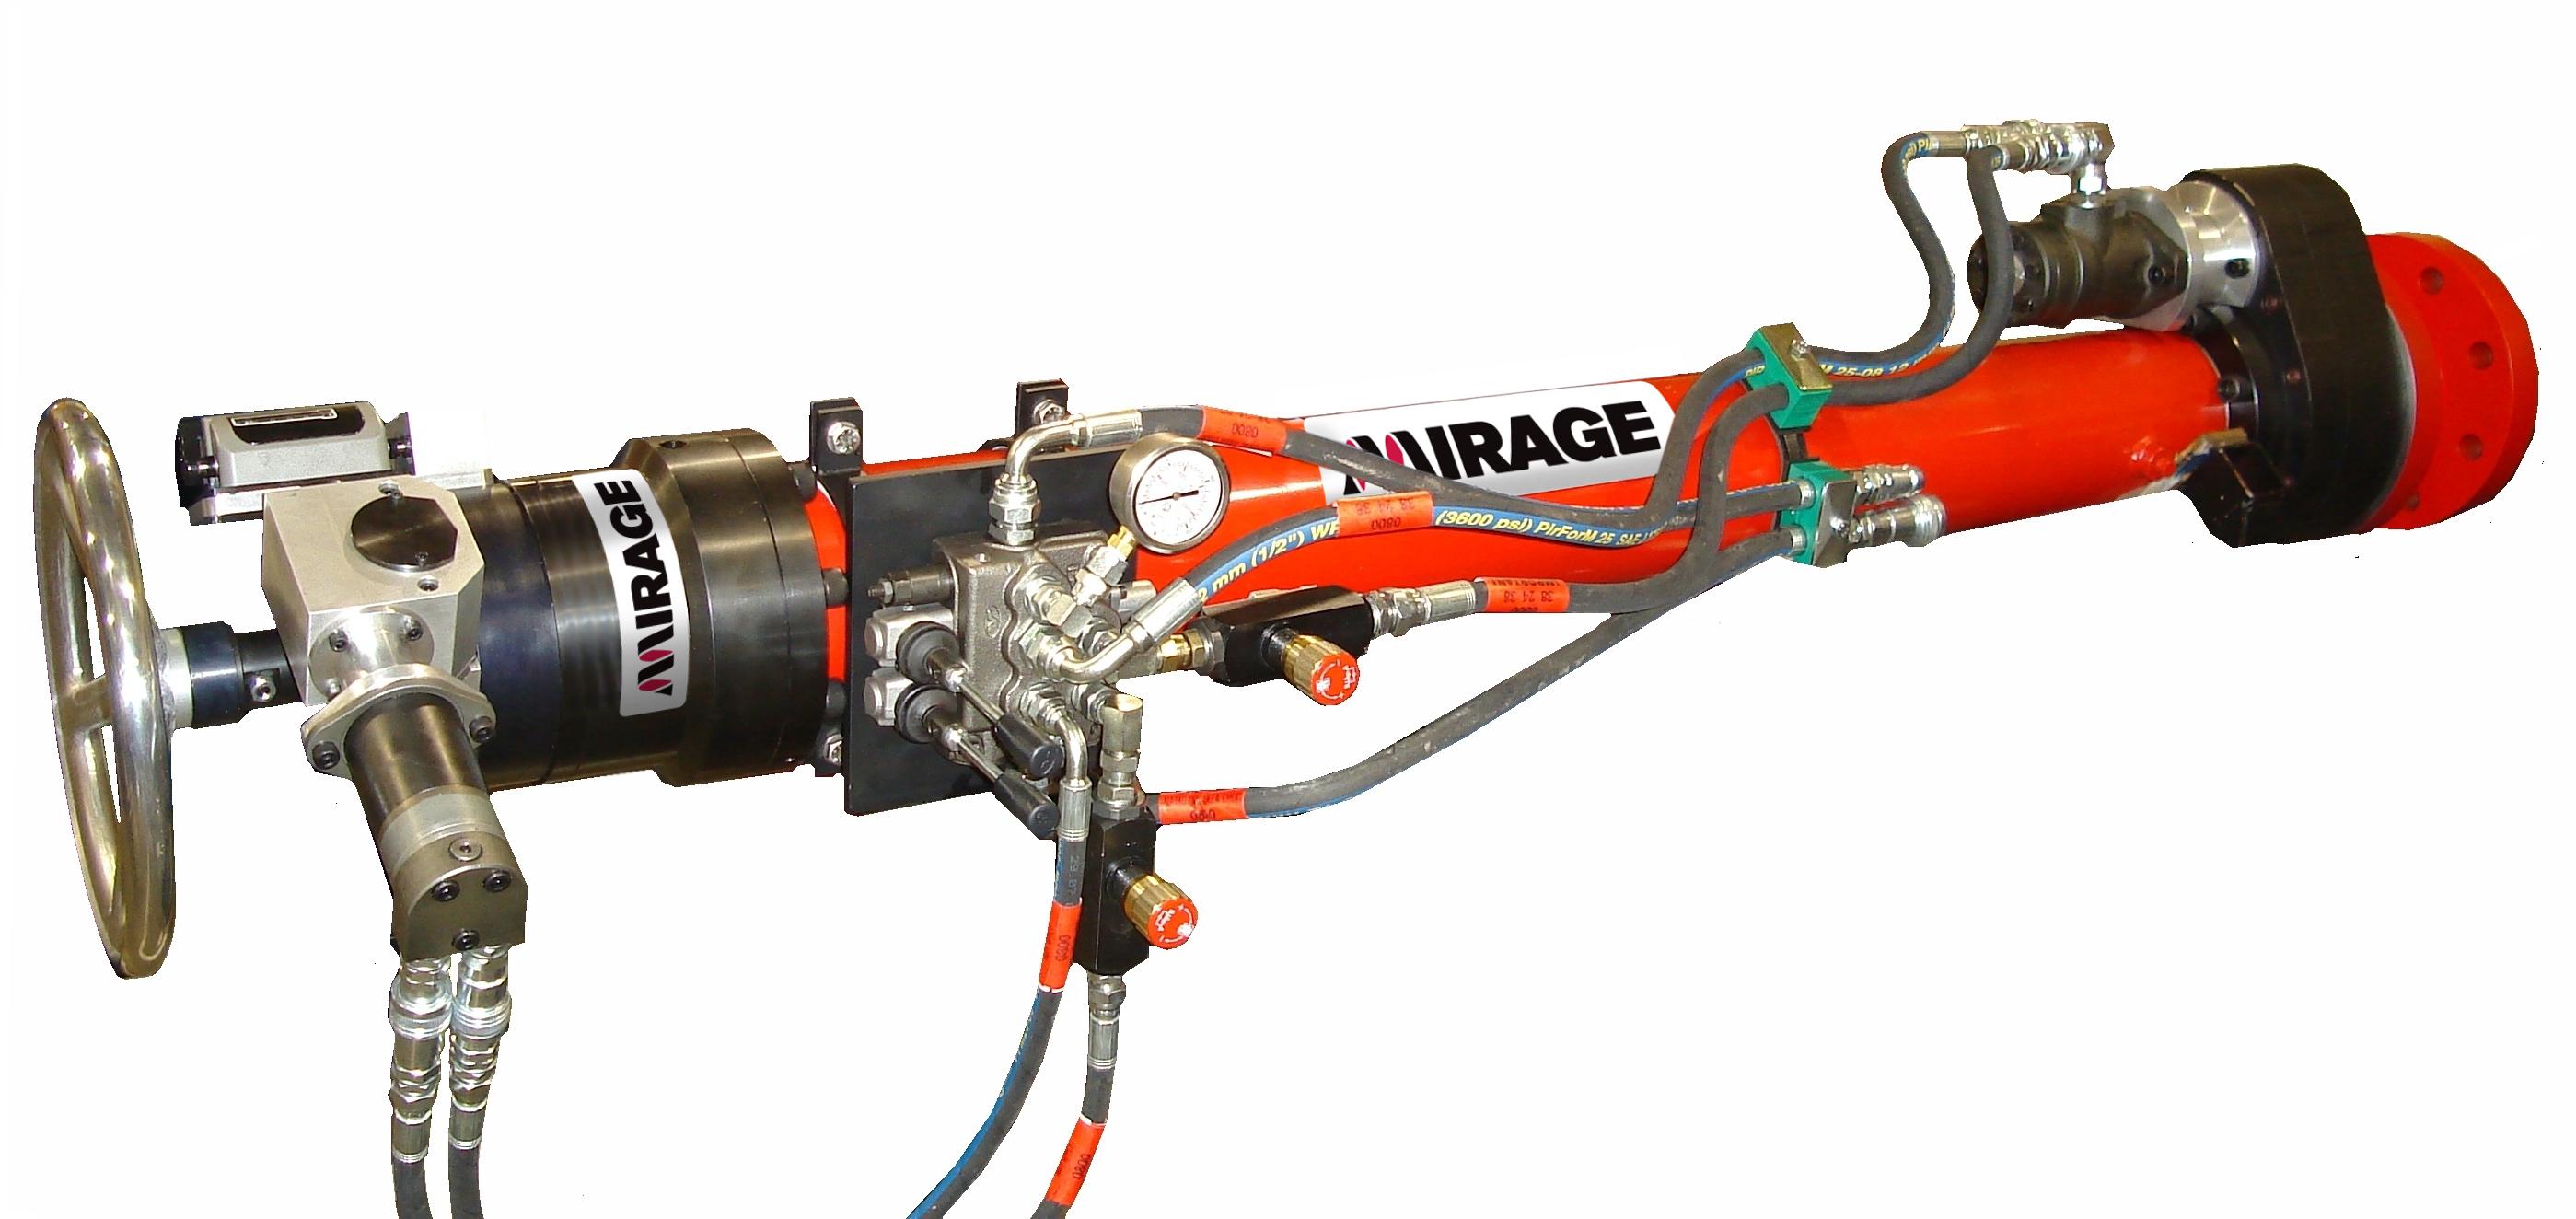 Pipeline Hot Tap Tool Wiring Diagrams Pc Power Saver Circuit Diagram Nonstopfree Electronic Circuits